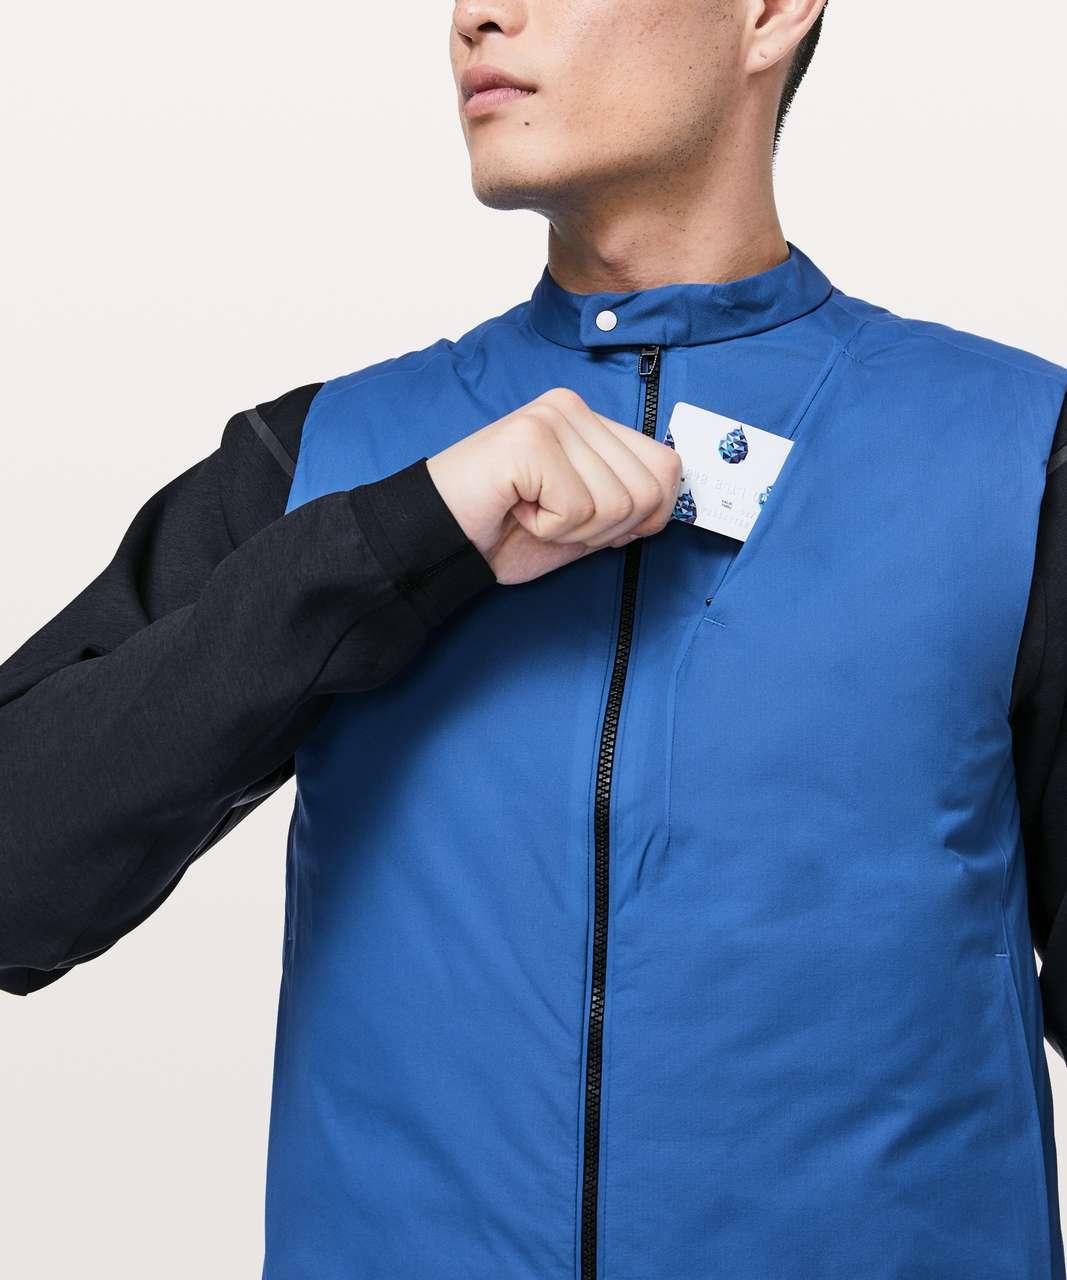 Lululemon Accedo Vest *Reversible lululemon Lab - Chromatic Blue / Black